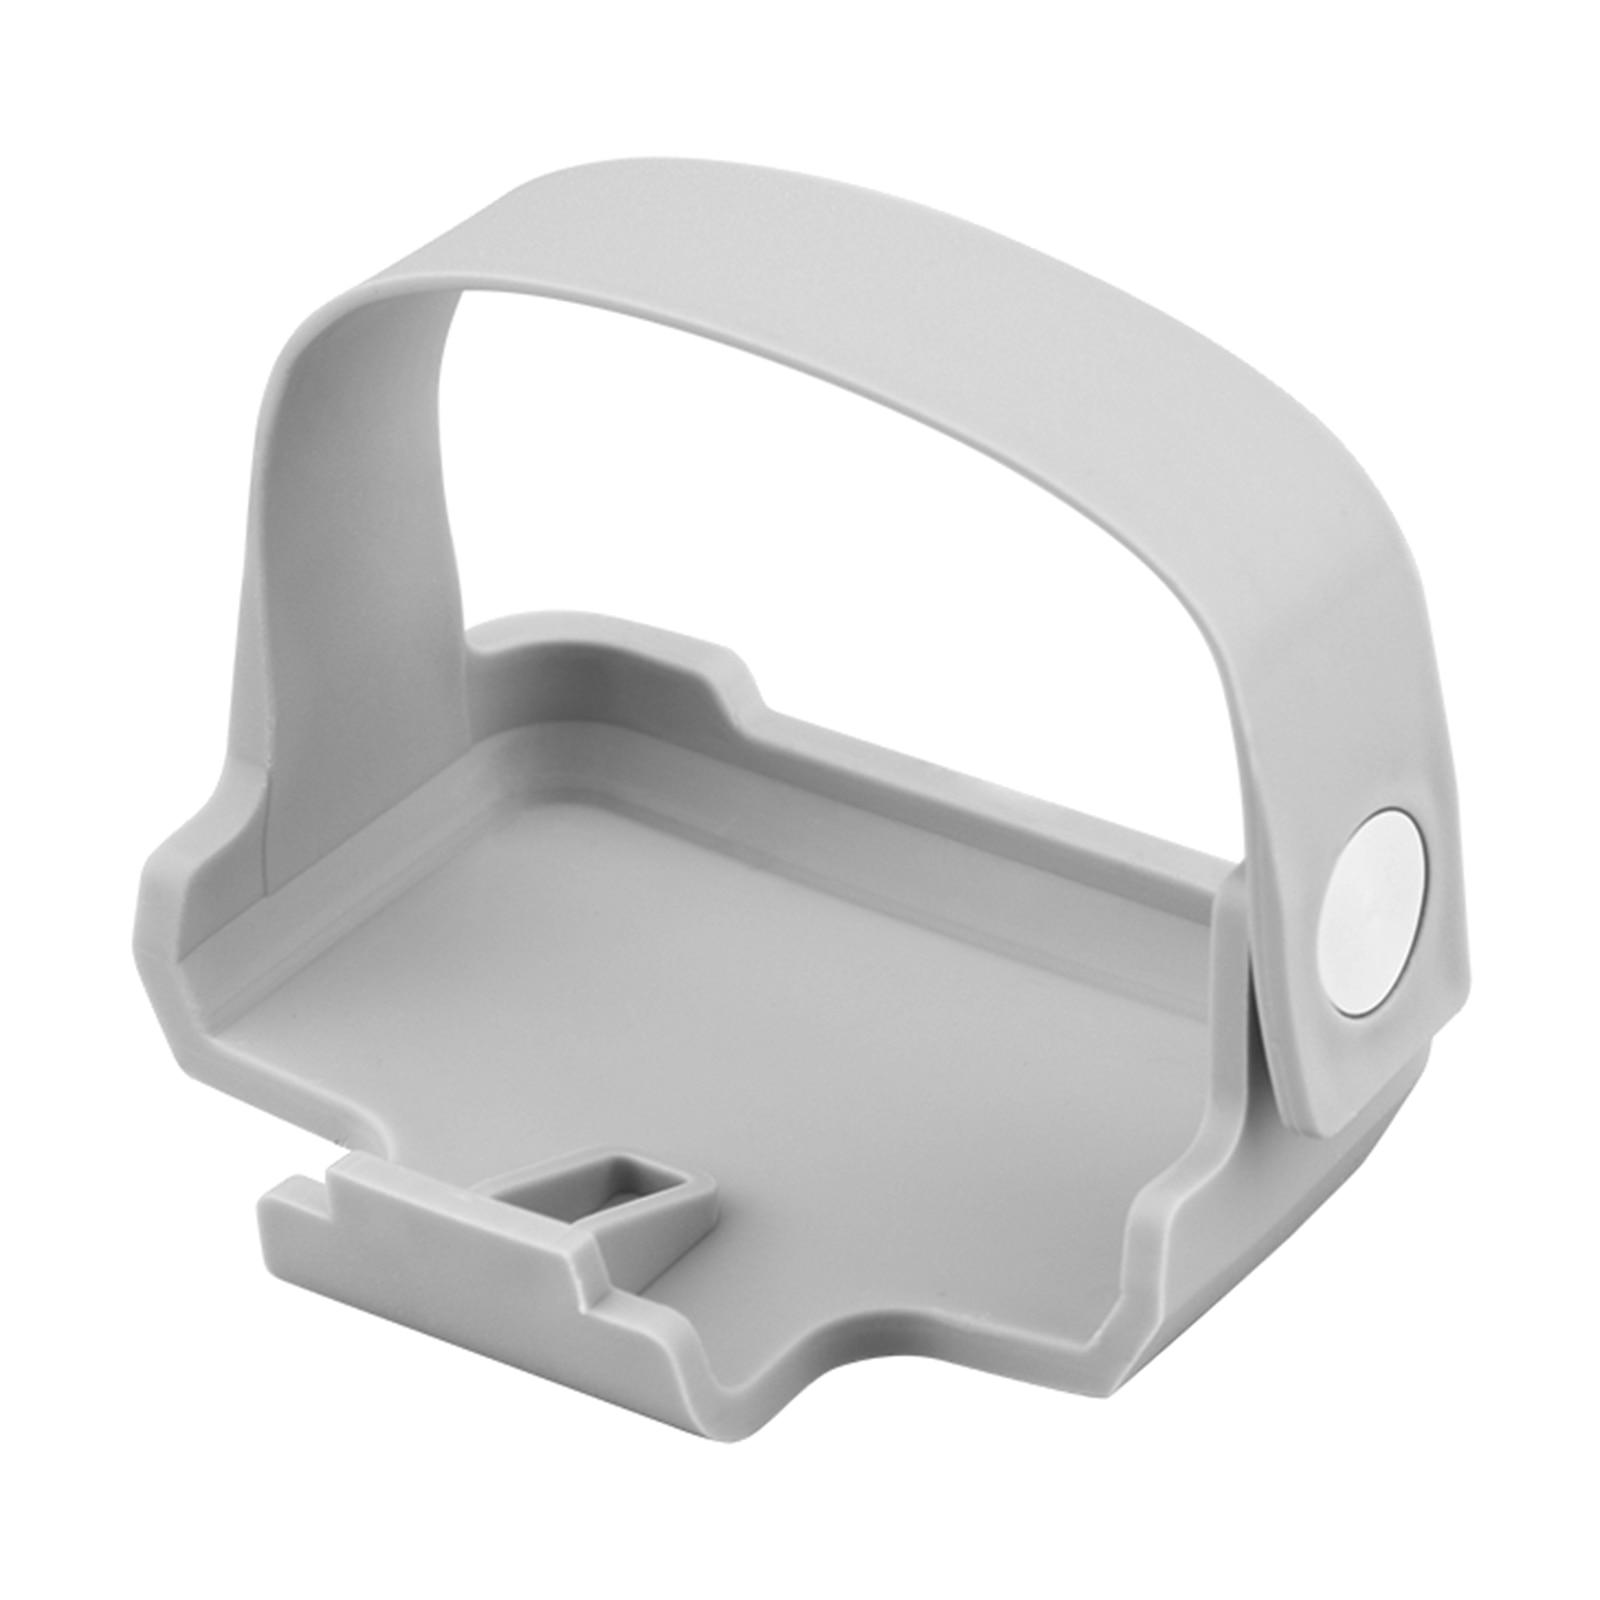 estabilizador-de-soporte-de-helice-para-dji-mavic-mini-mini-2-accesorios